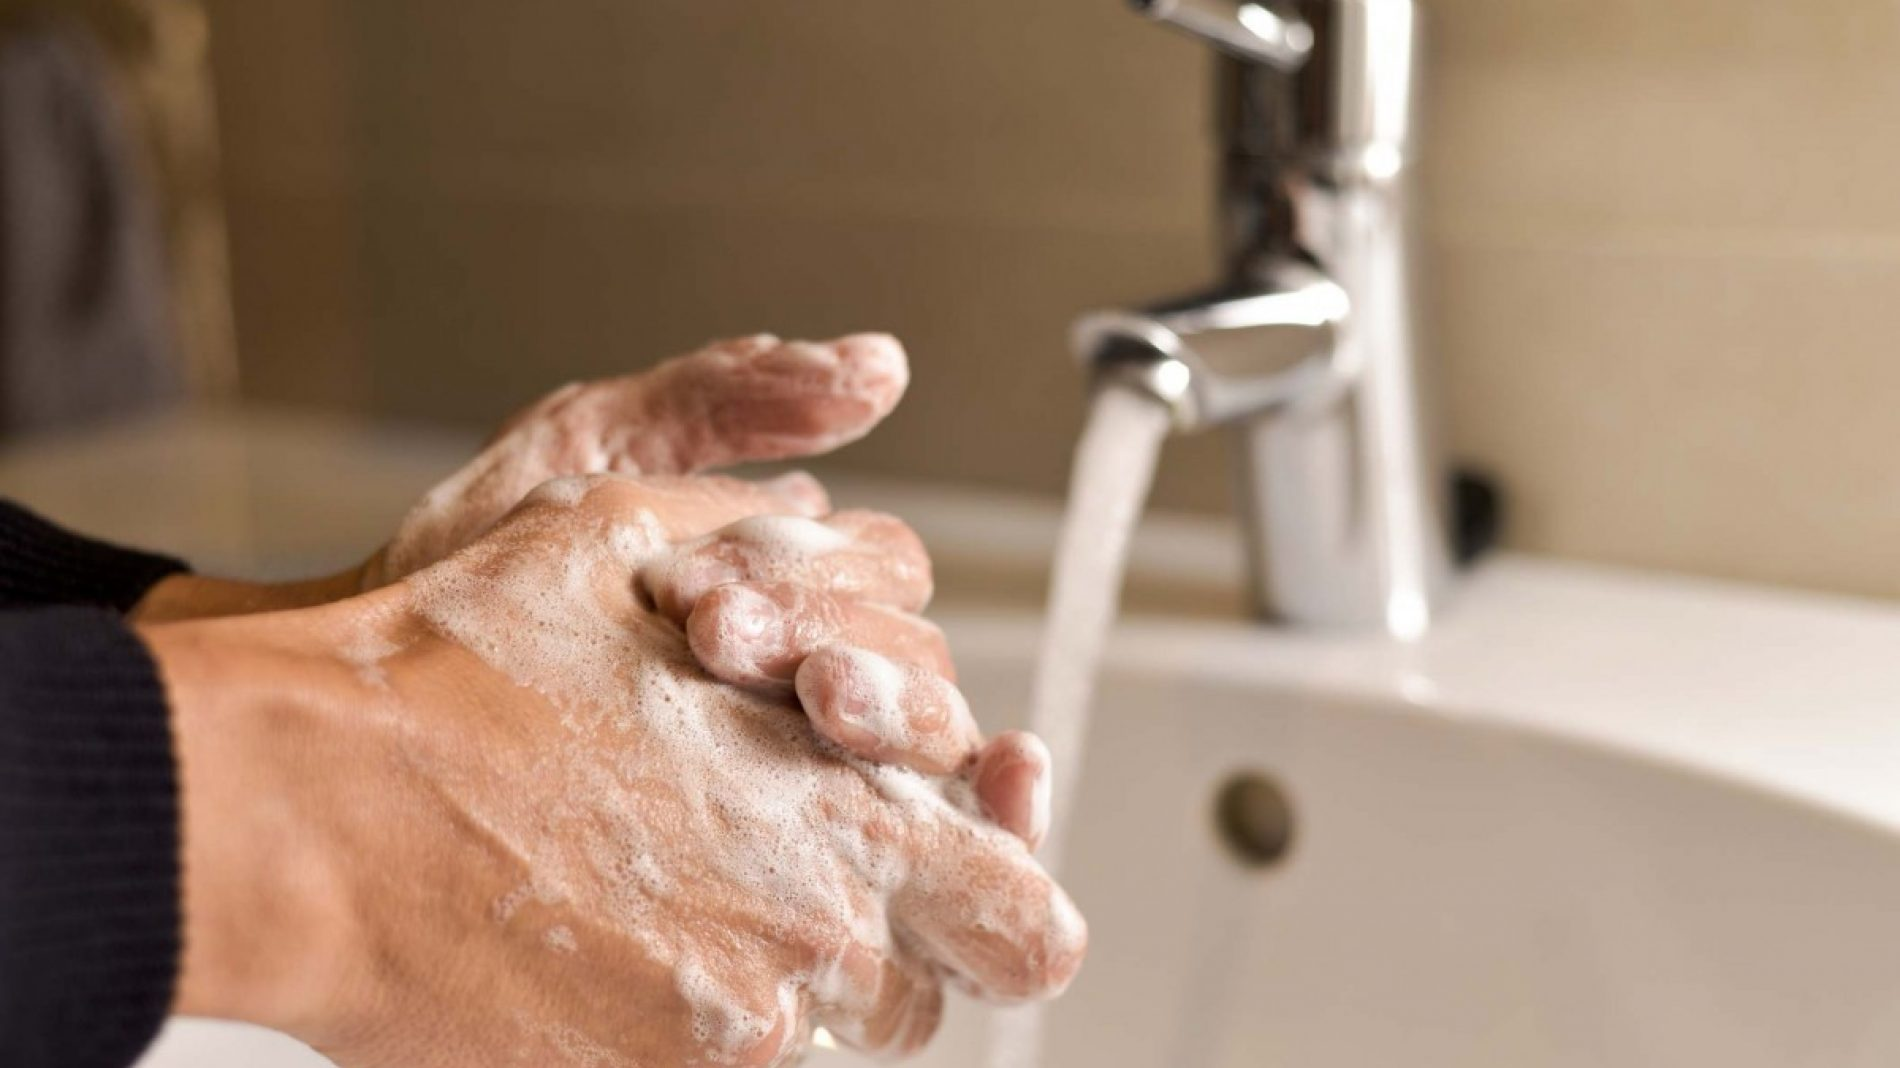 man washing his hands